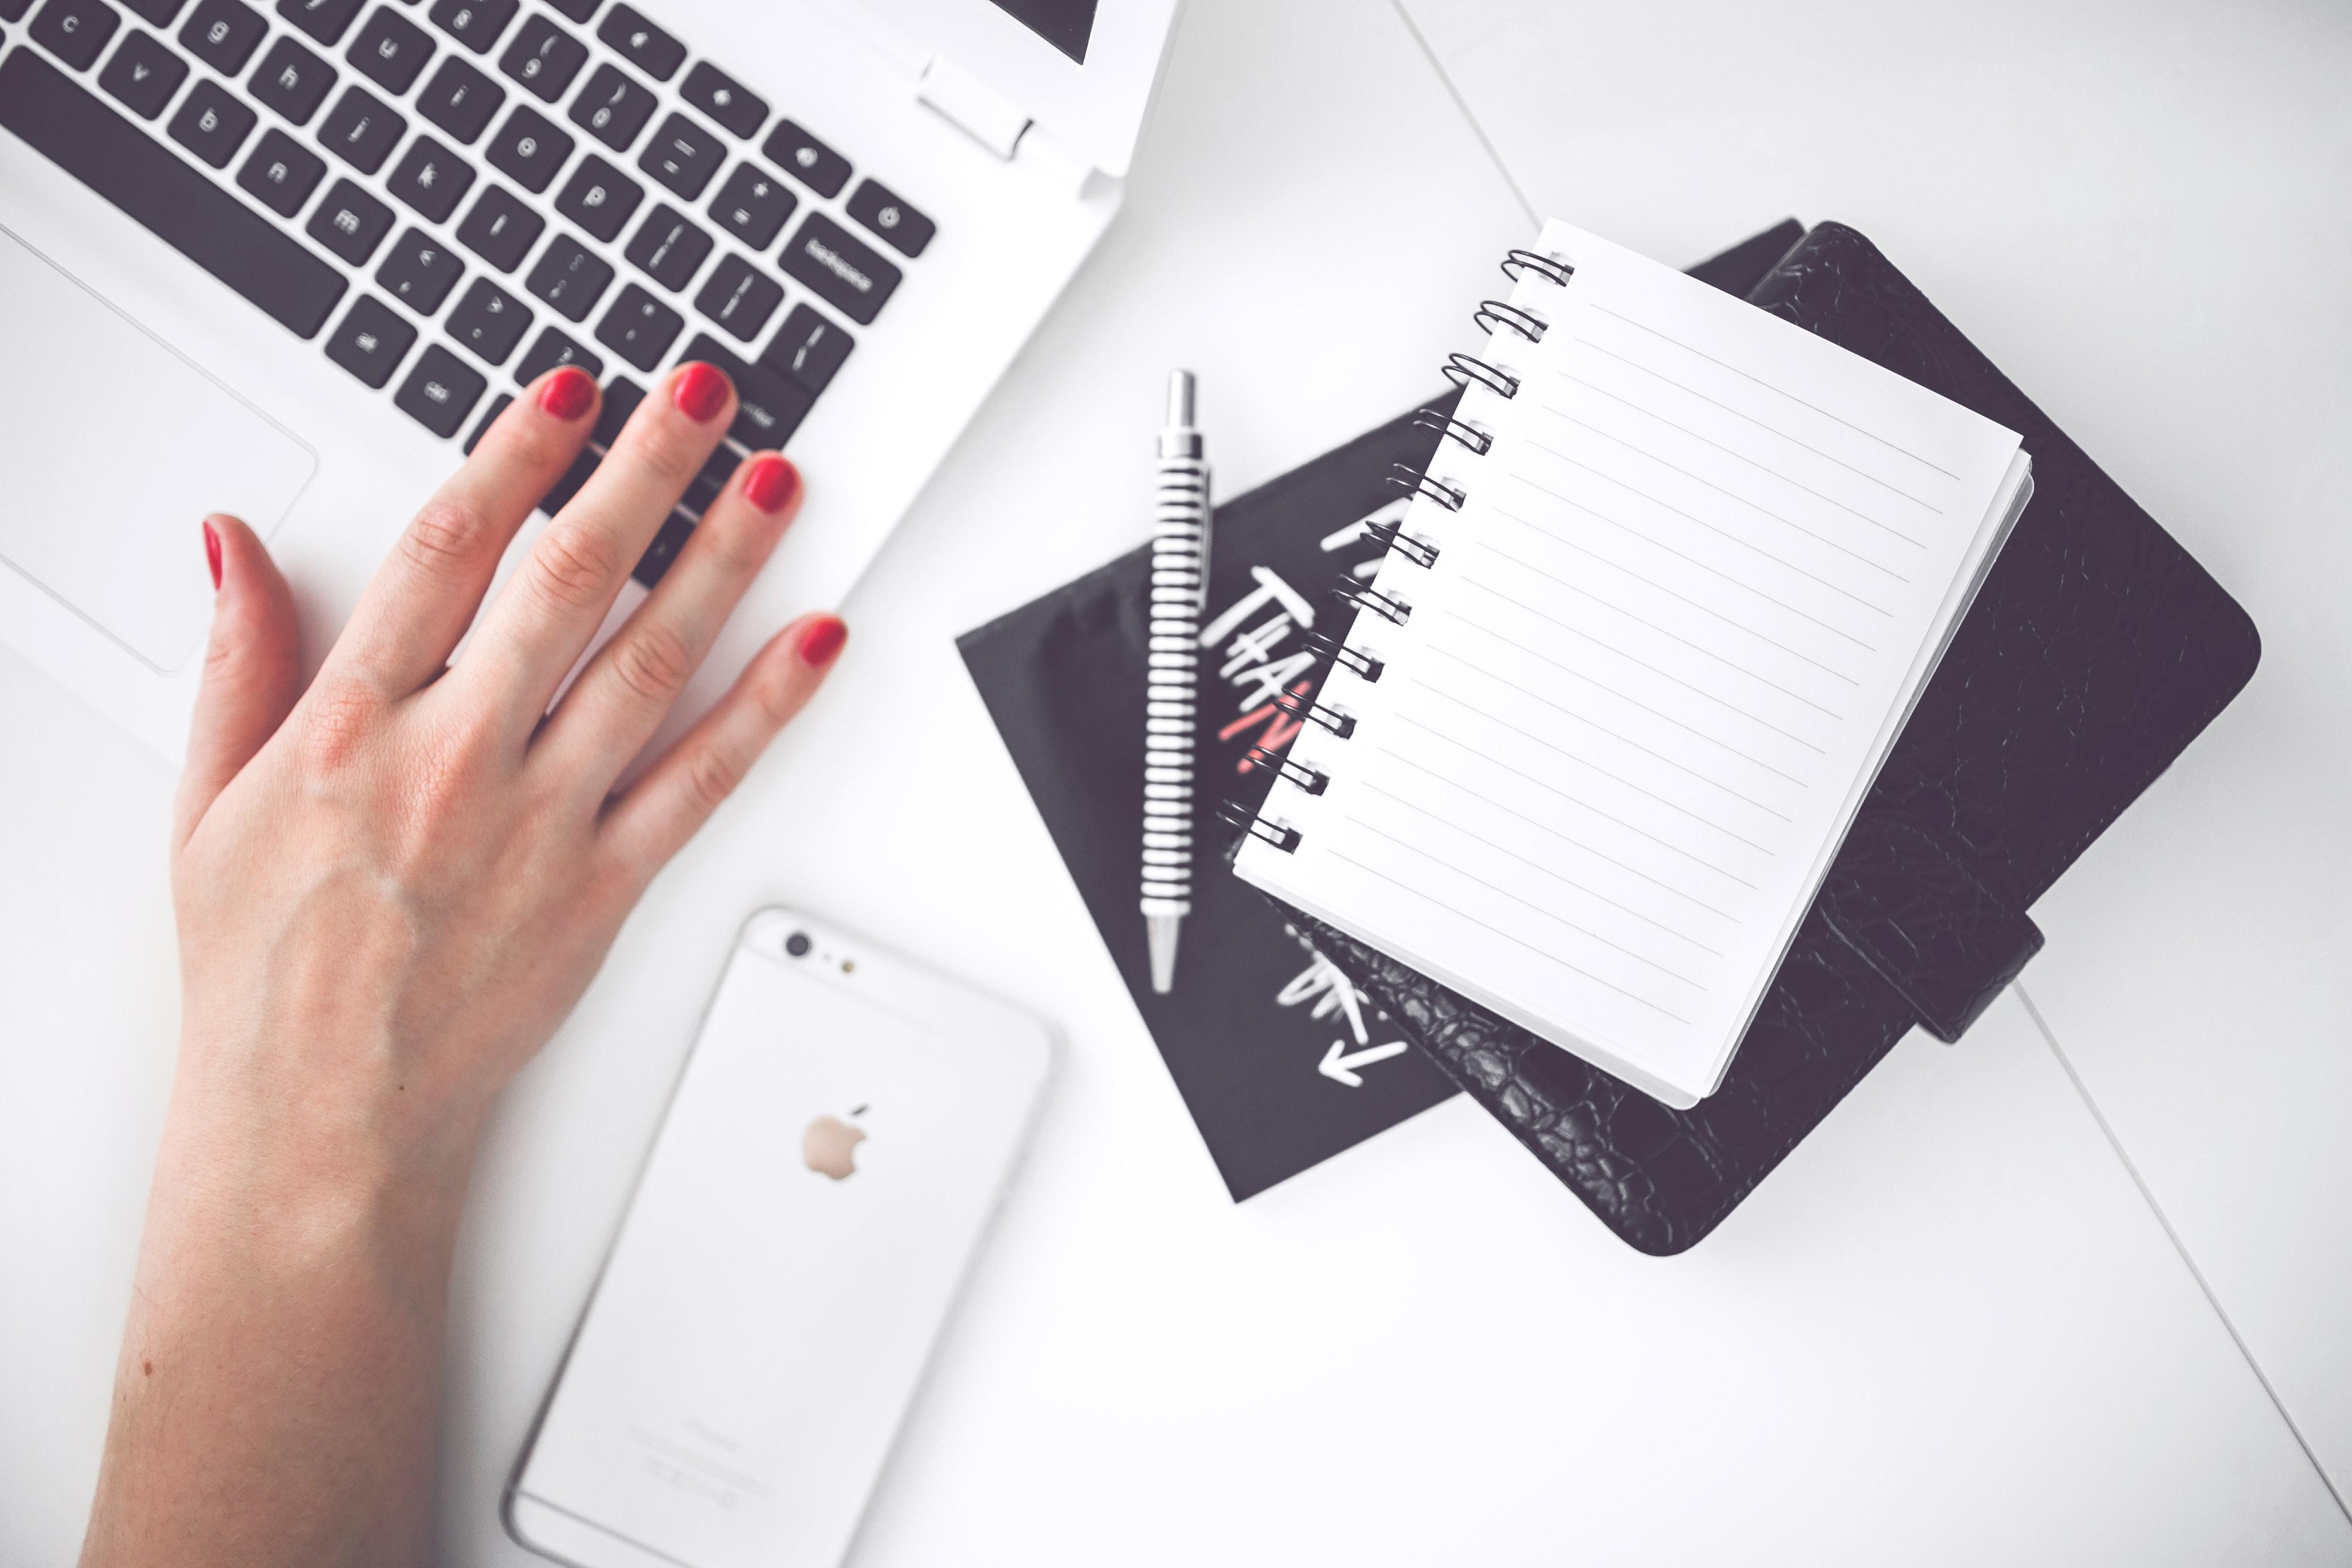 White laptop, female hand, note, pen, phone, desk, Top view, Technology, Smartphone, Pov, HQ Photo